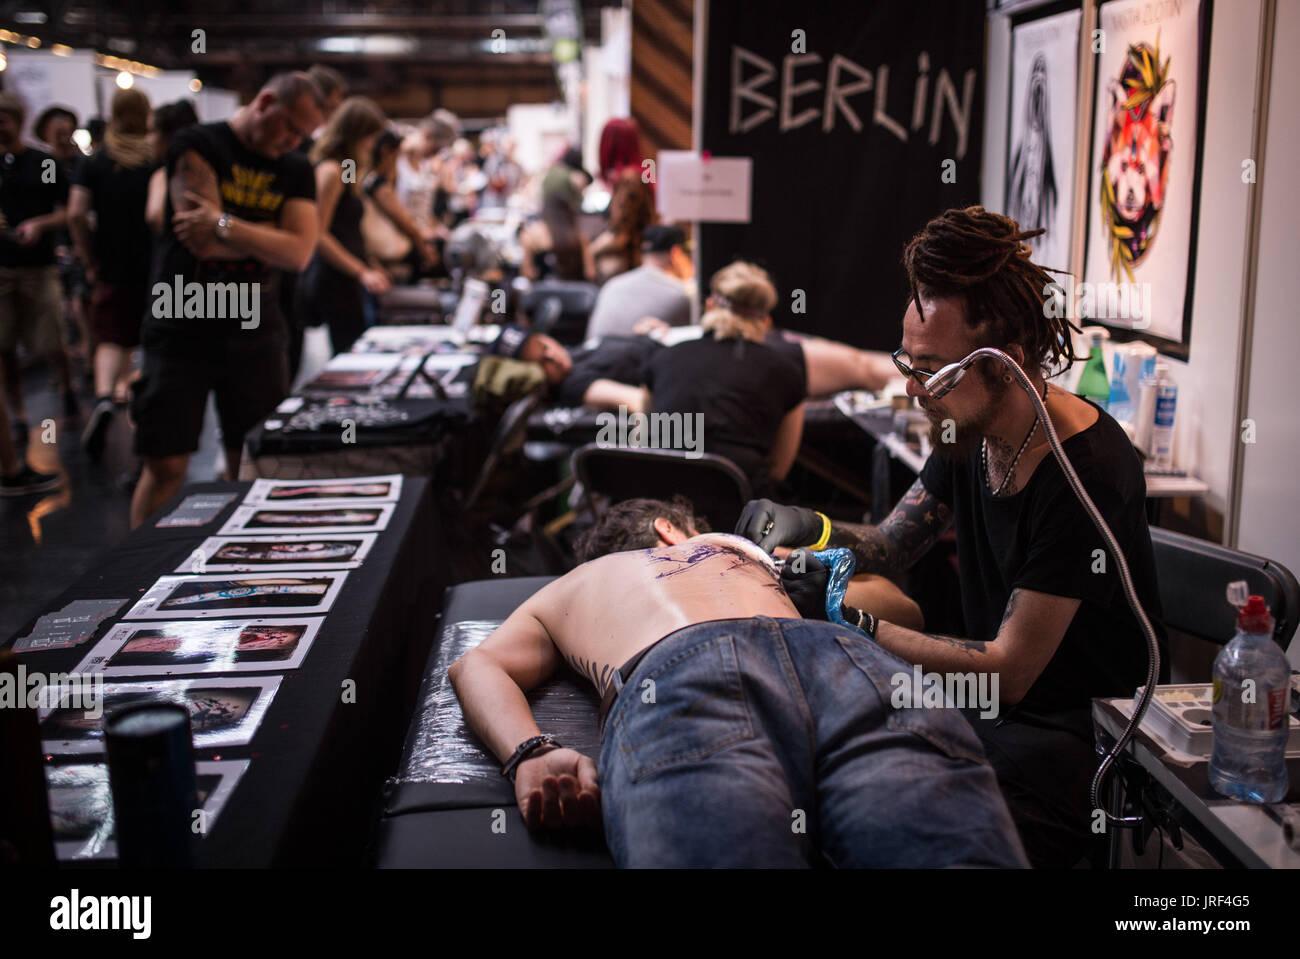 International tattoo convention stock photos for Tattoo convention 2017 denver